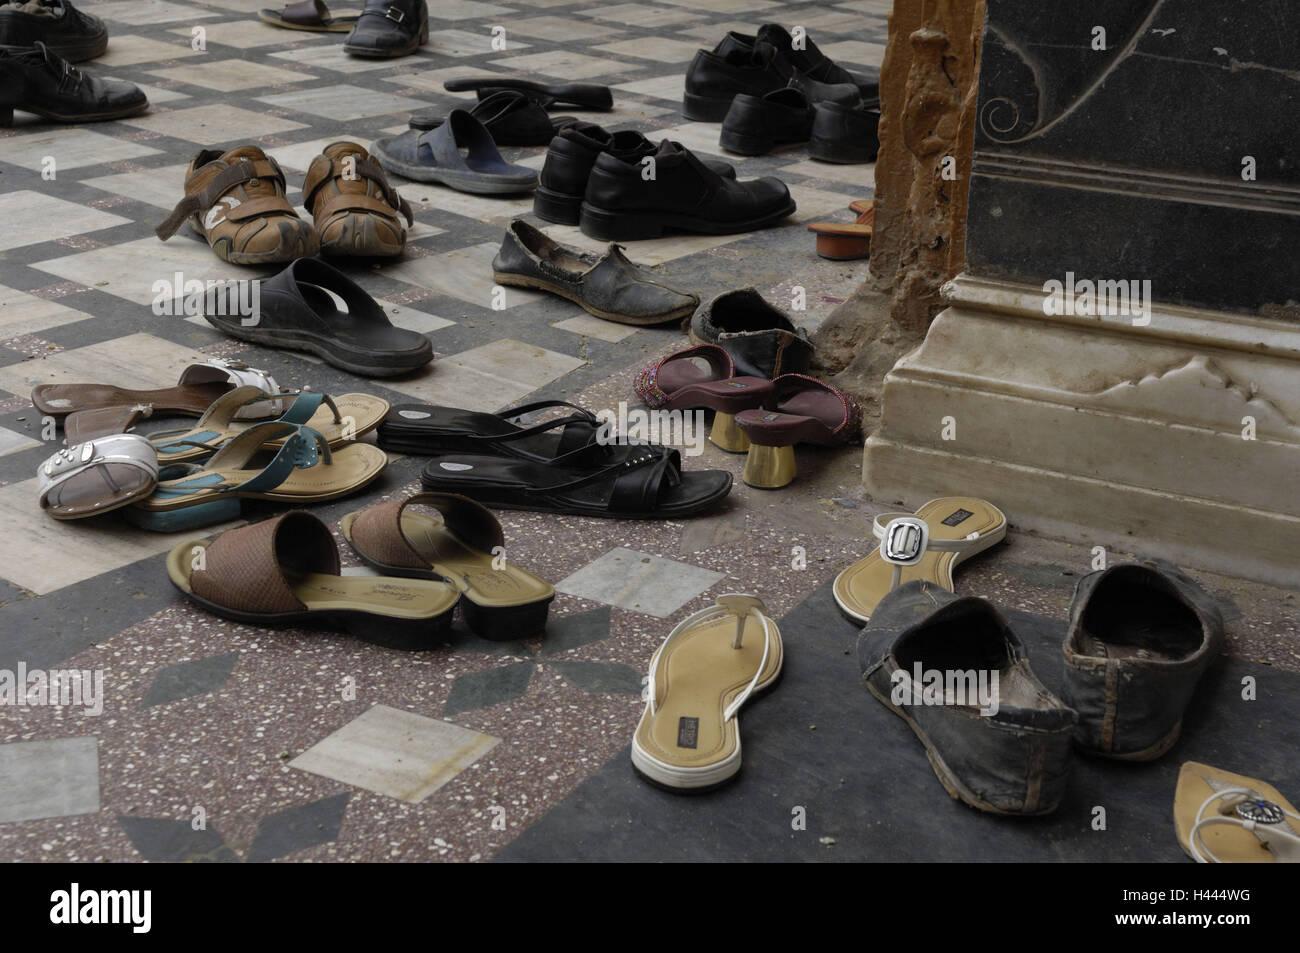 reputable site 52d63 767d0 Indien, Rajasthan, Deshnok, Tempel, Schuhe Stockfoto, Bild ...